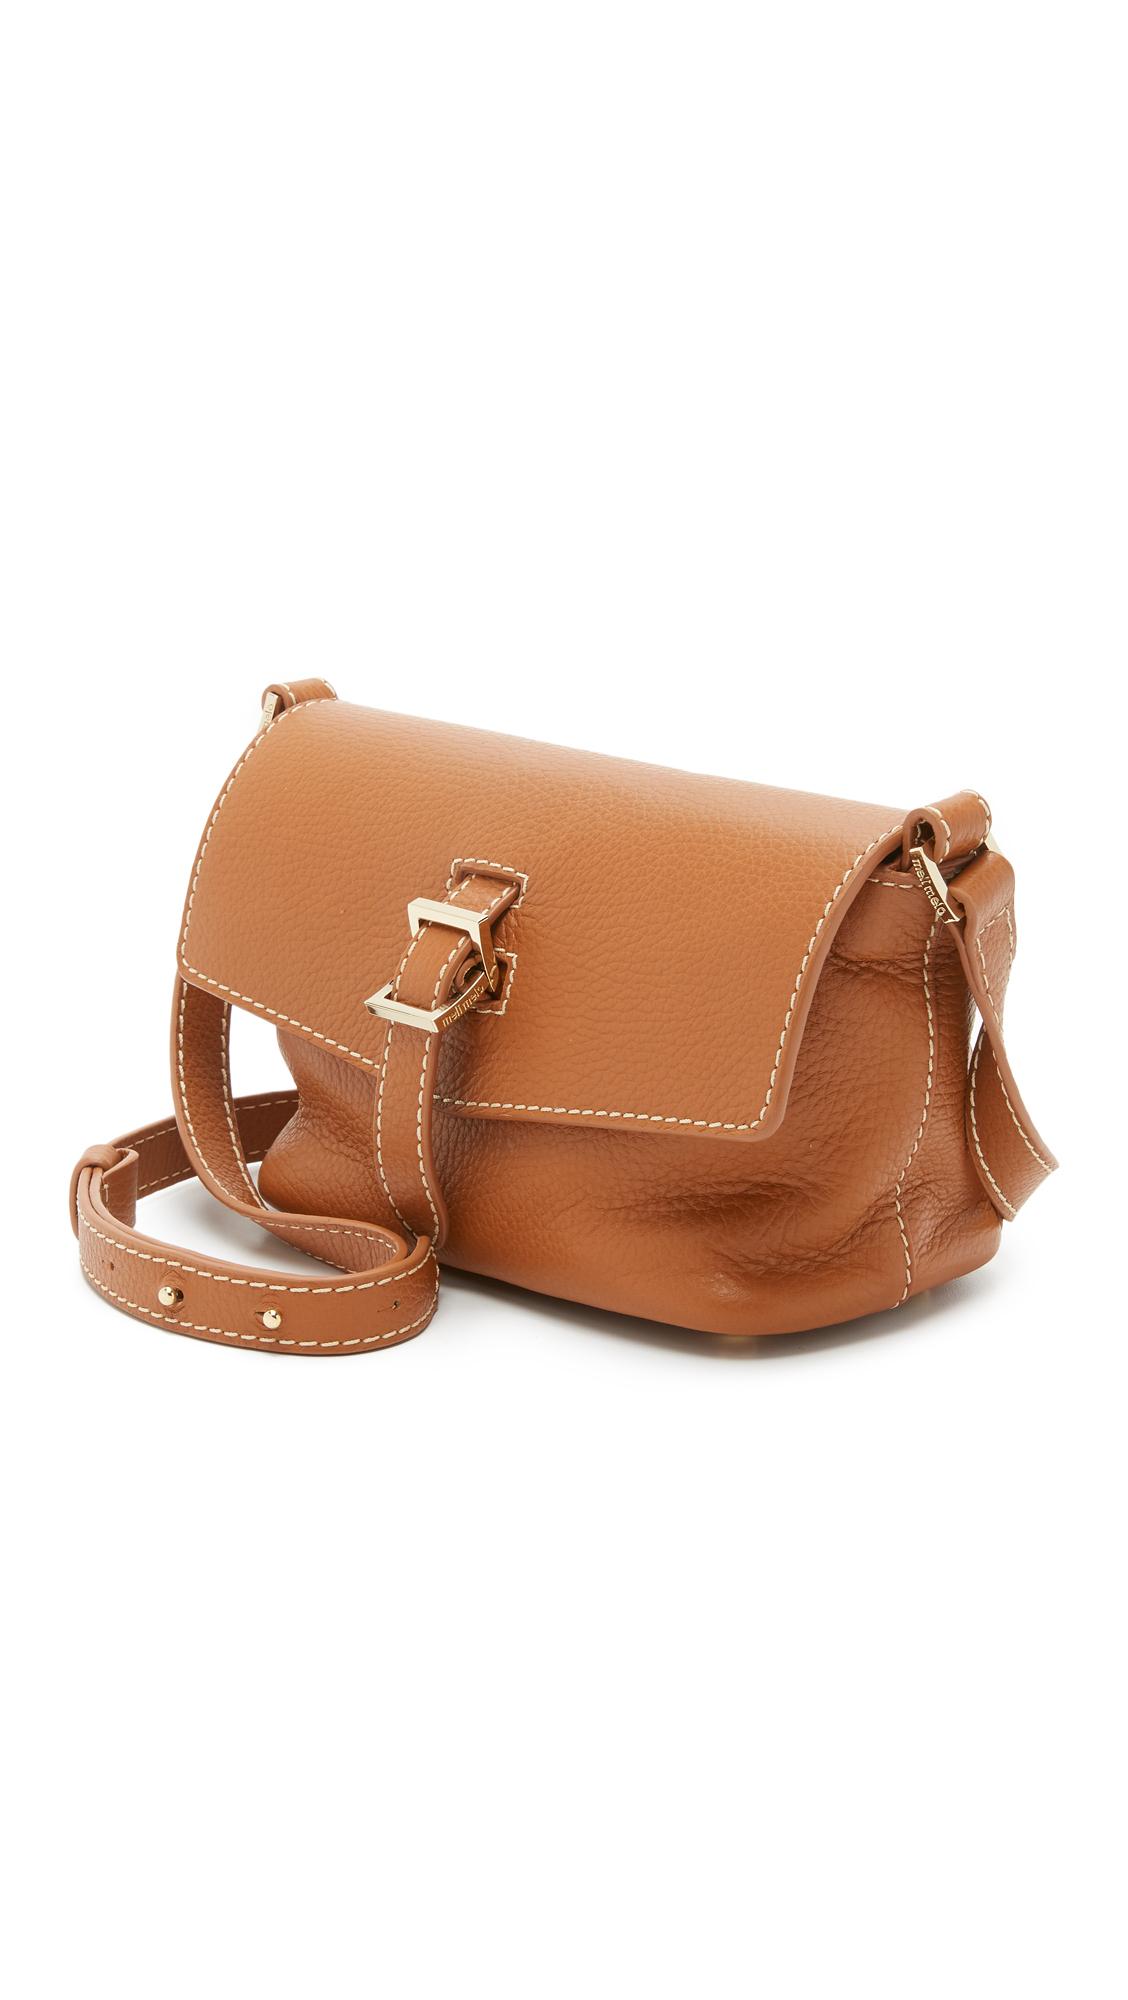 meli melo Maisie Micro Cross Body Bag in Tan (Brown)